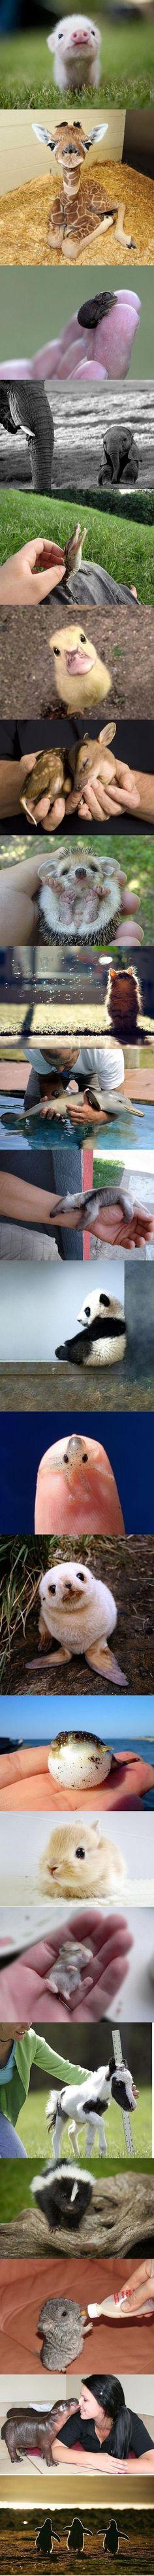 baby animals … so cute